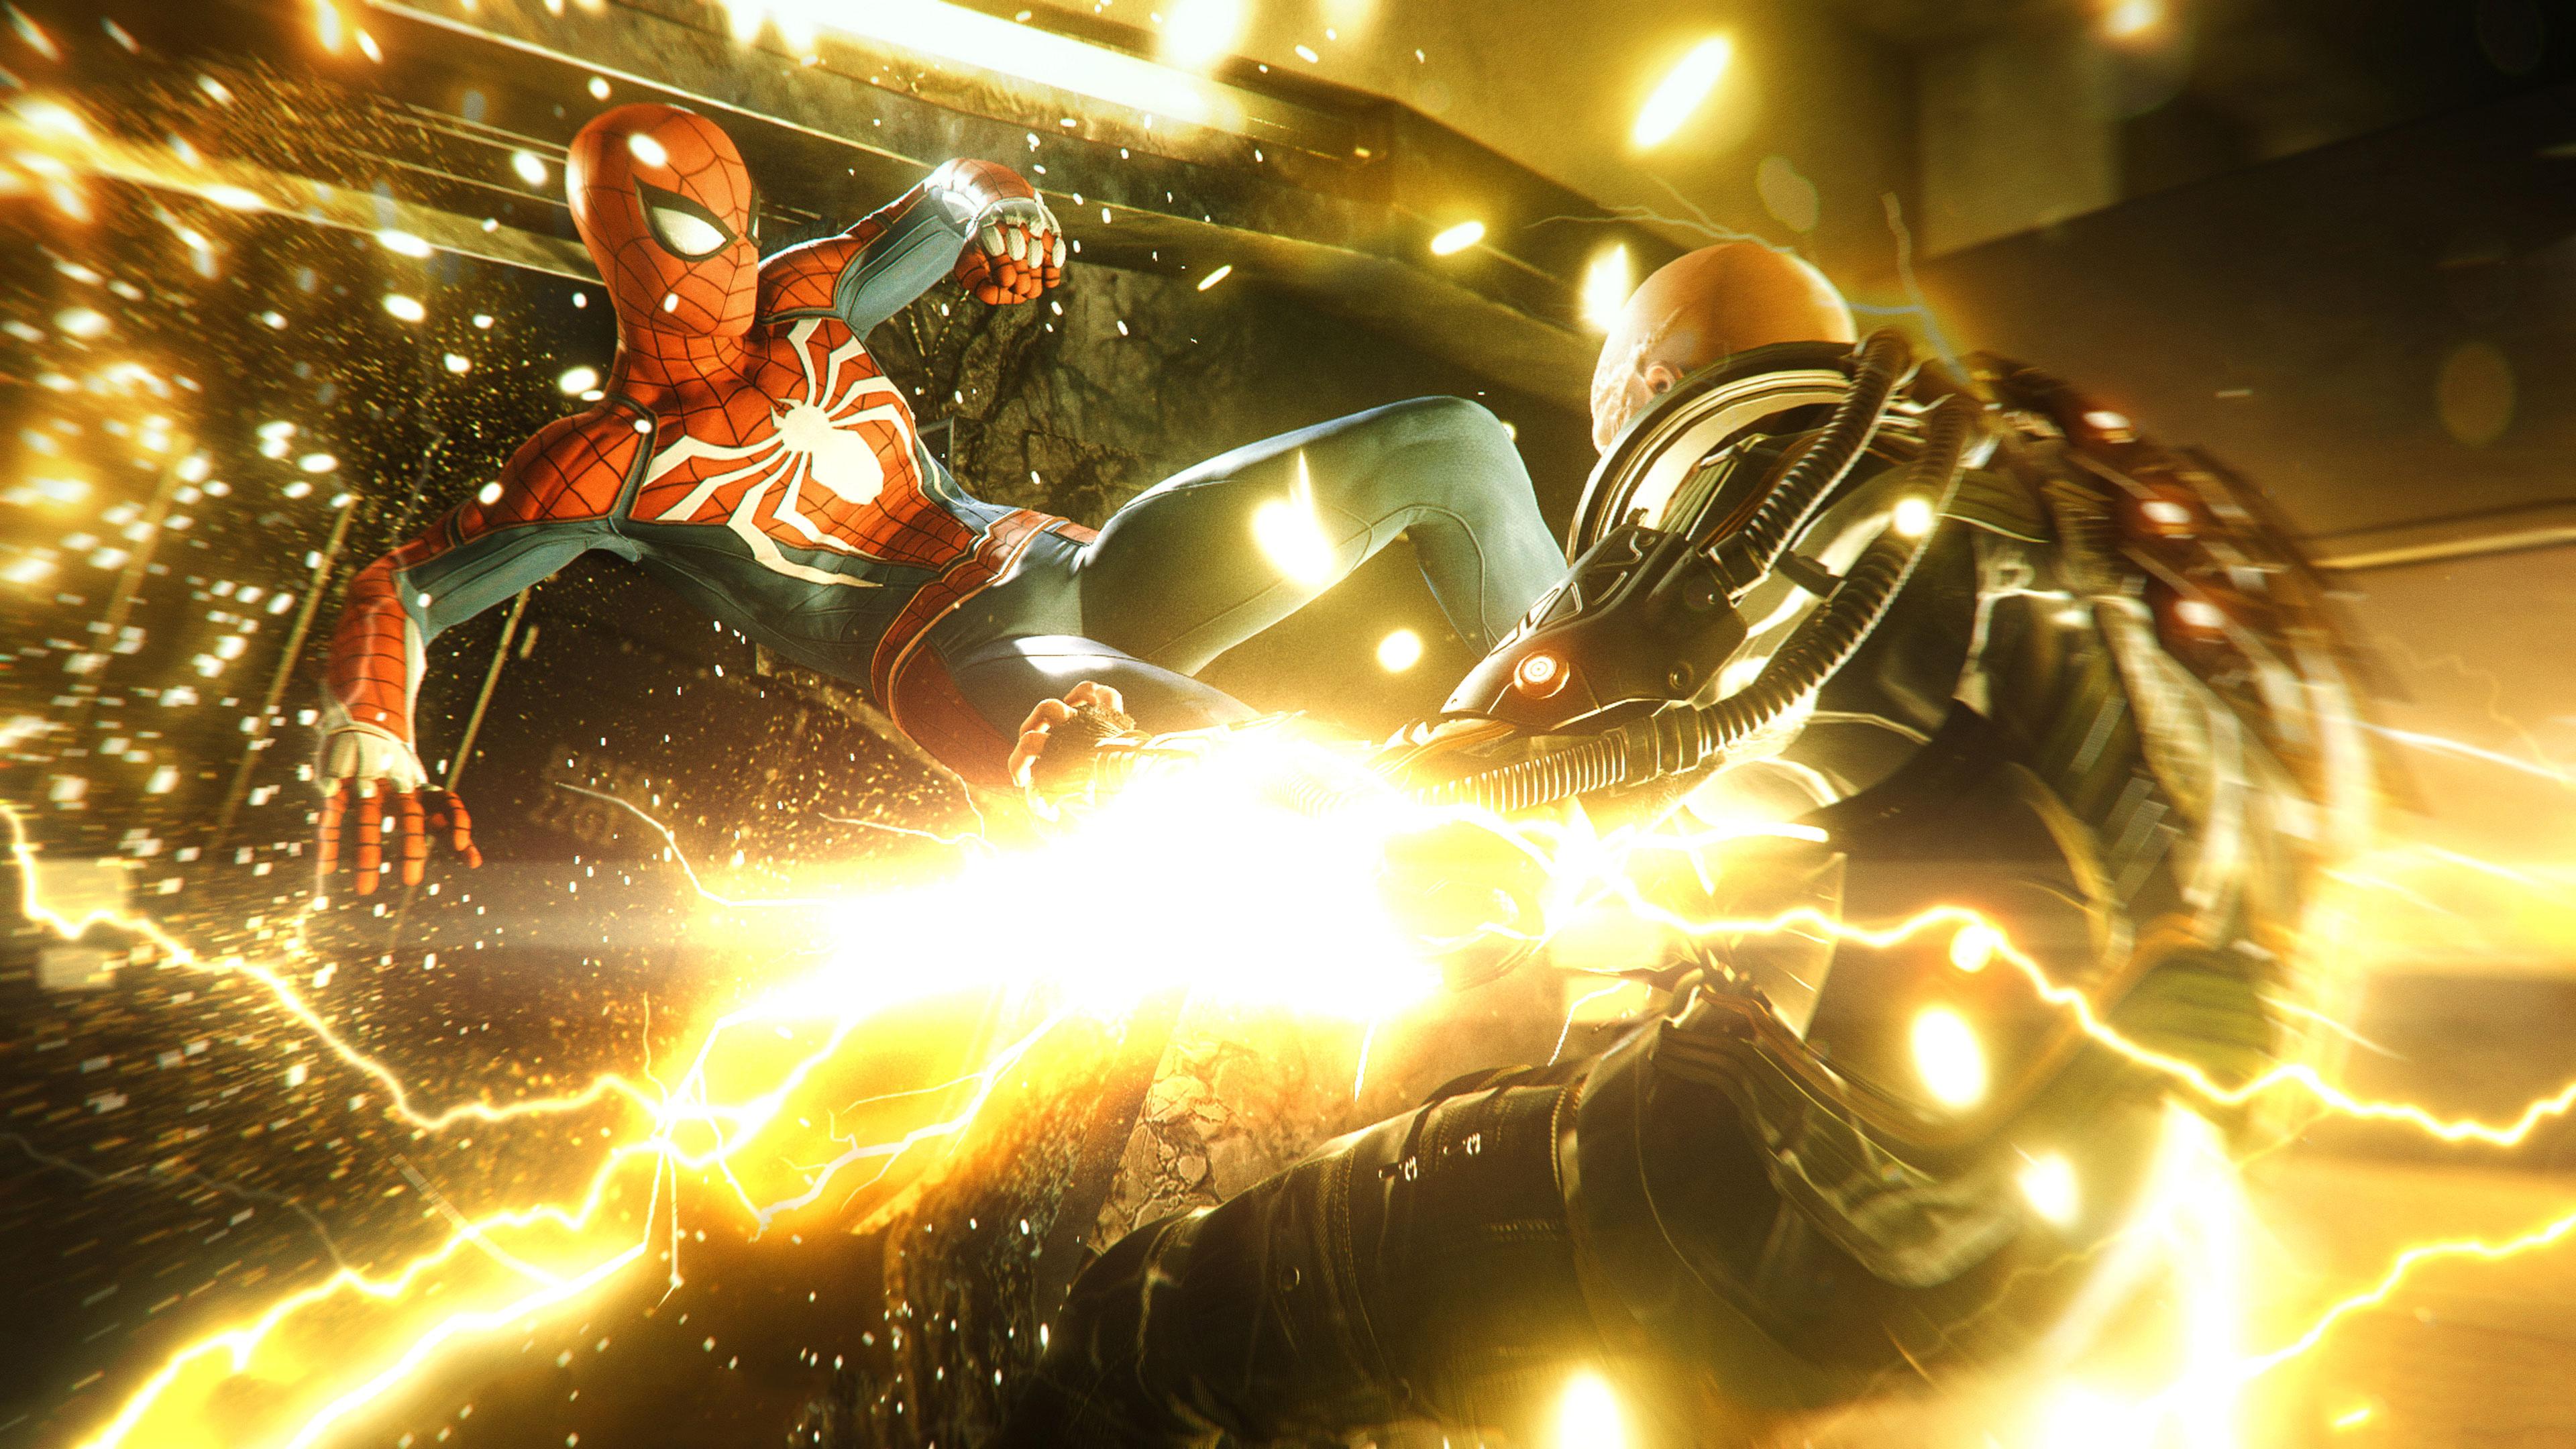 spiderman-kicking-electro-8x-3840x2160.jpg